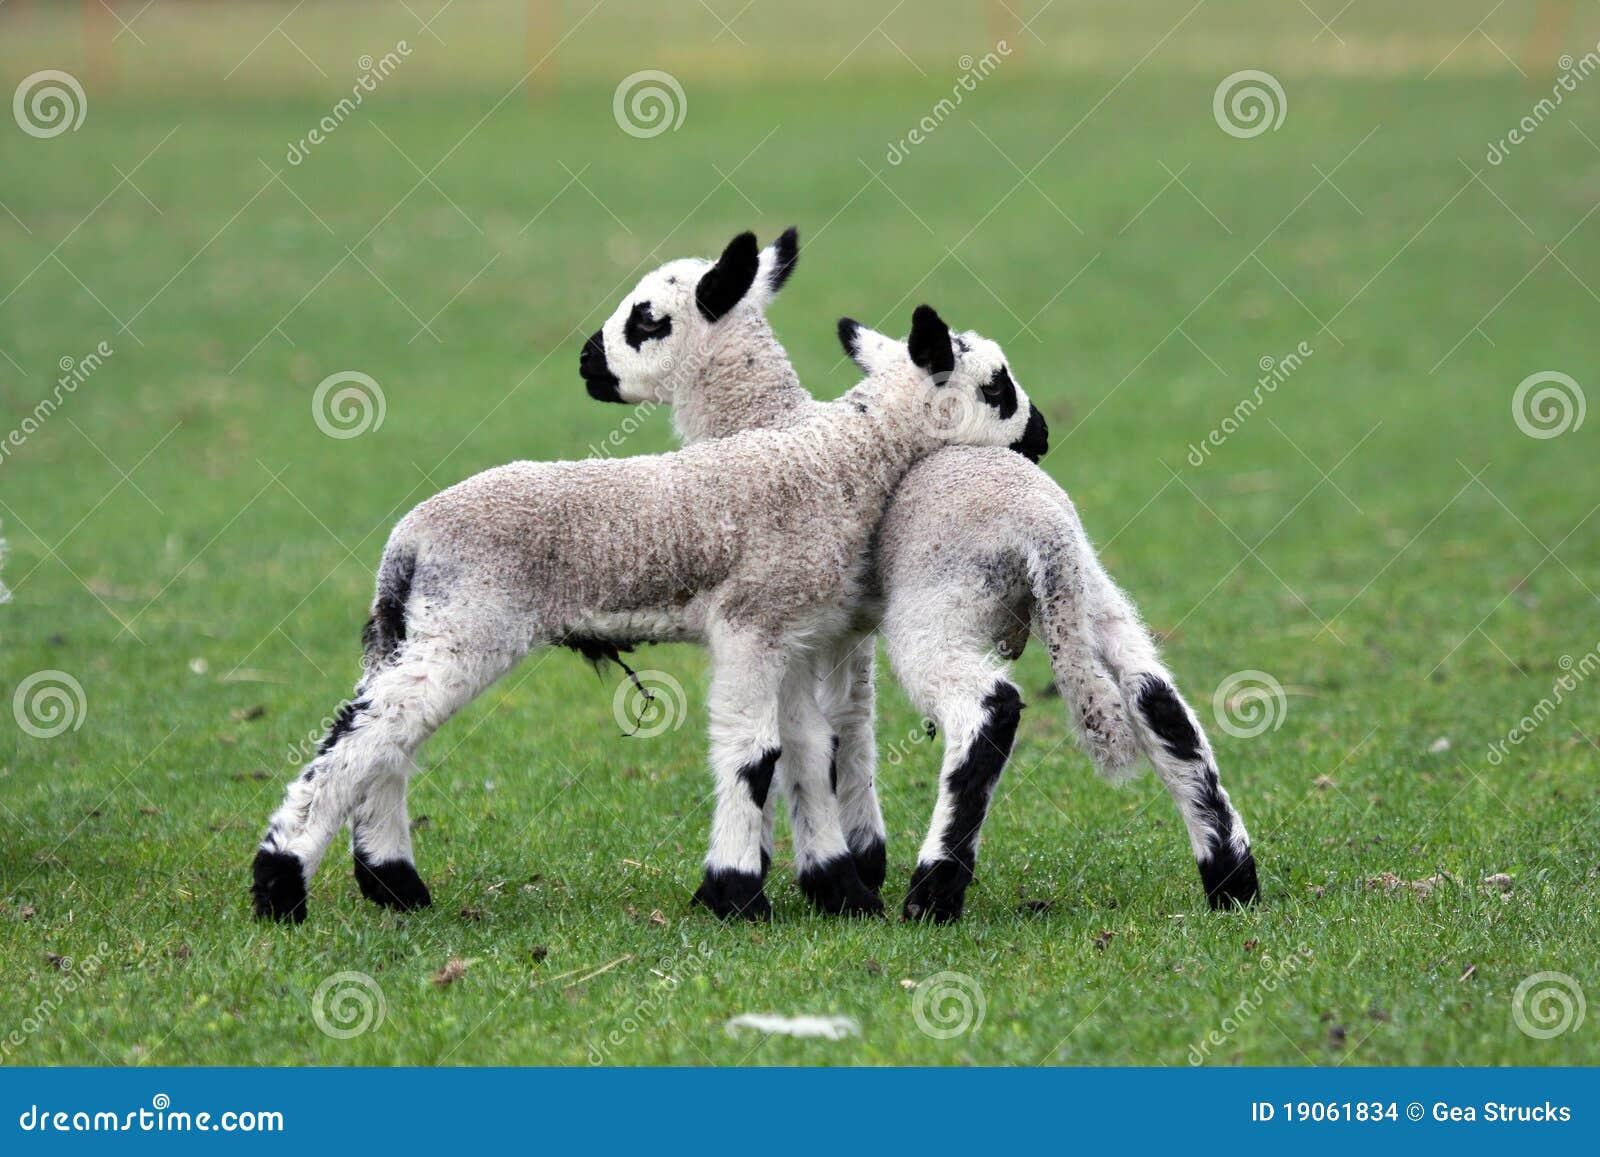 Newborn Lamb Twin Stock Image - Image: 19061741